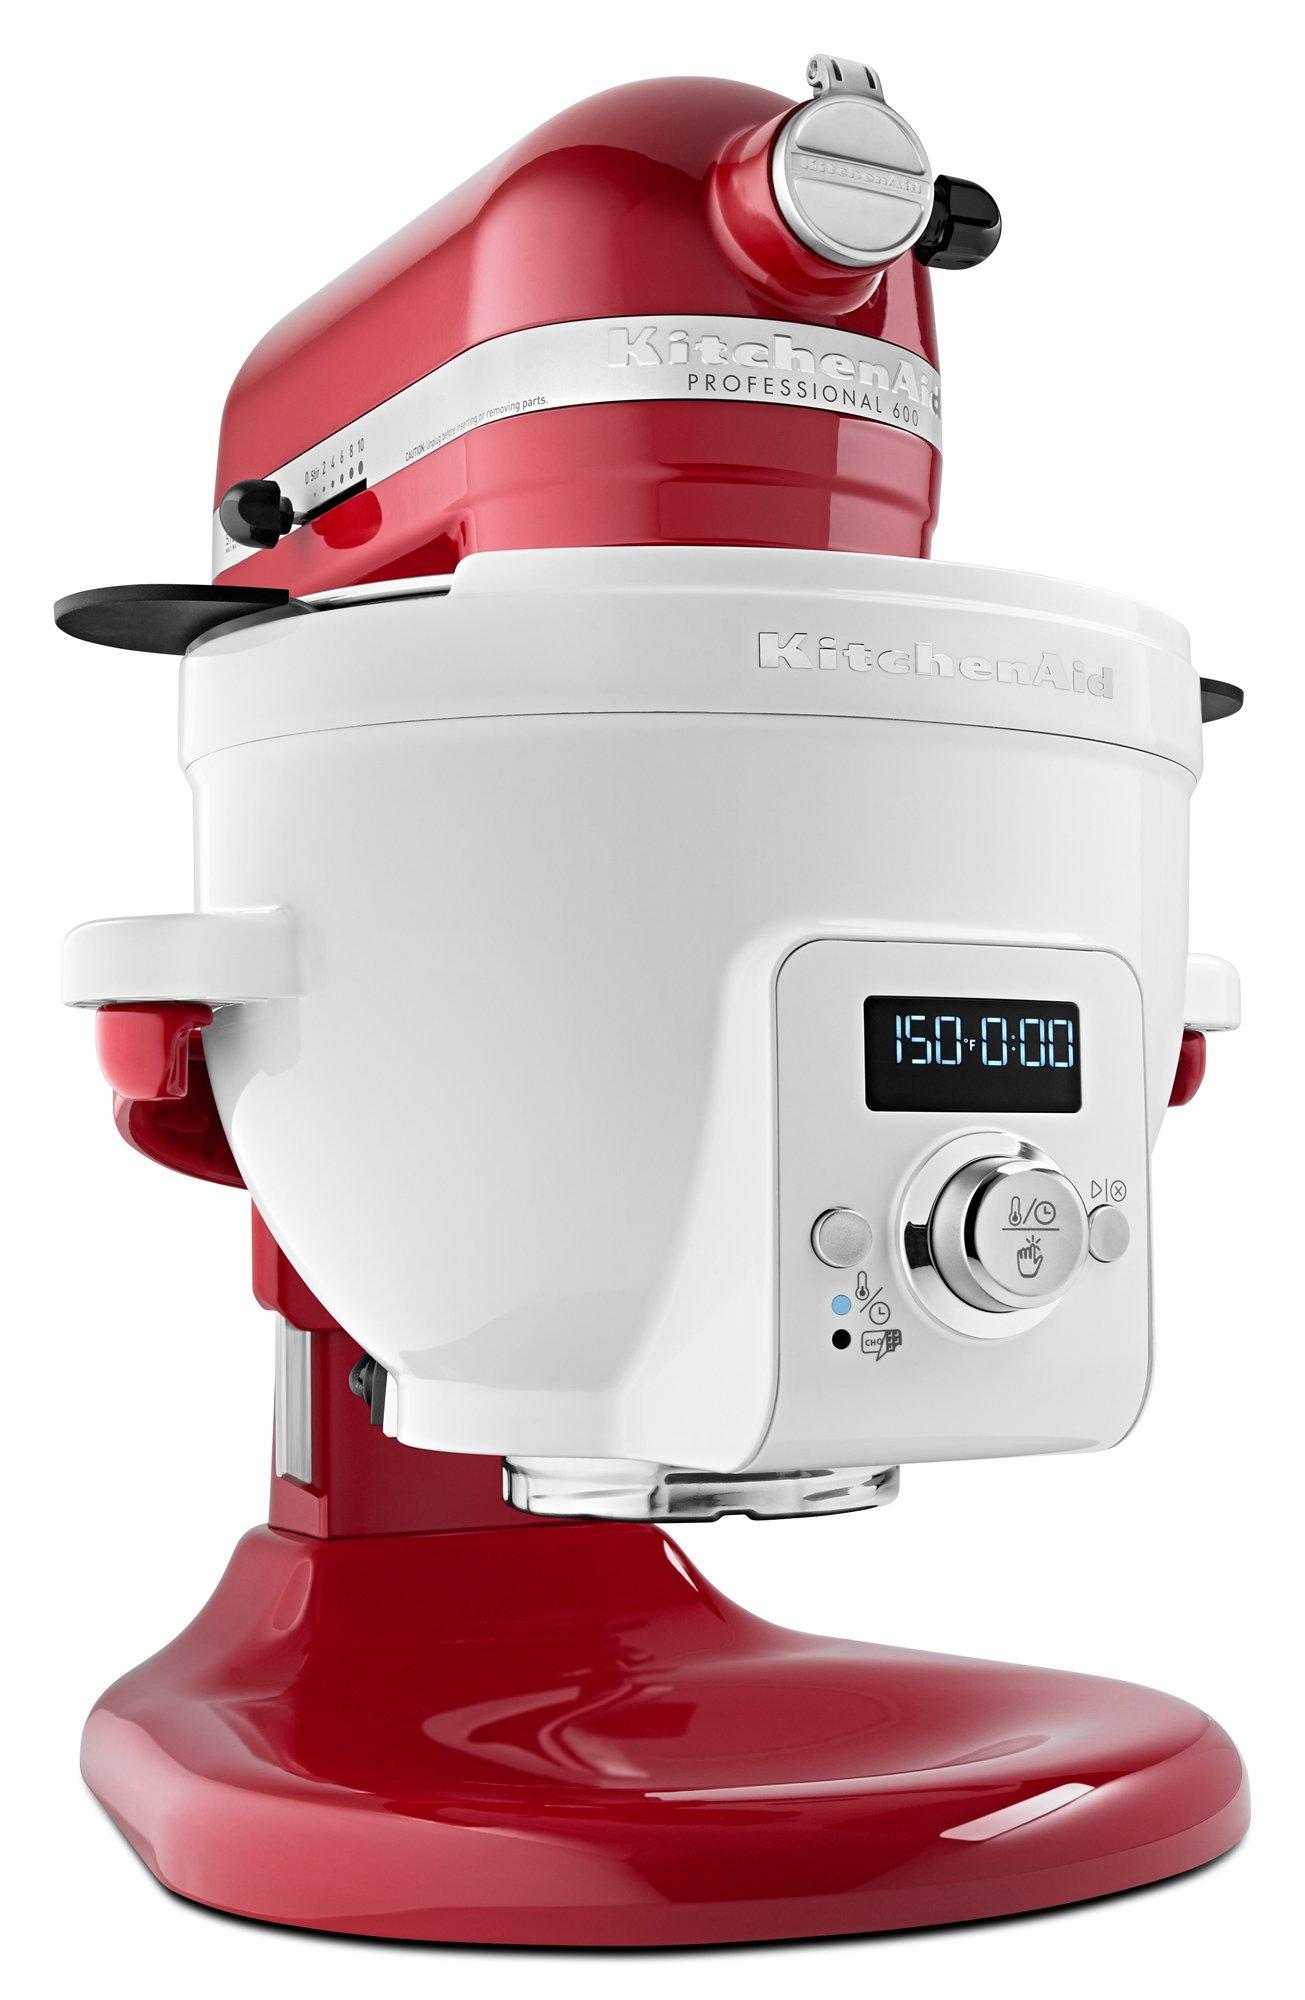 KitchenAid KSM1CBL Precise Heat Mixing Bowl For Bowl-Lift Stand Mixers by KitchenAid